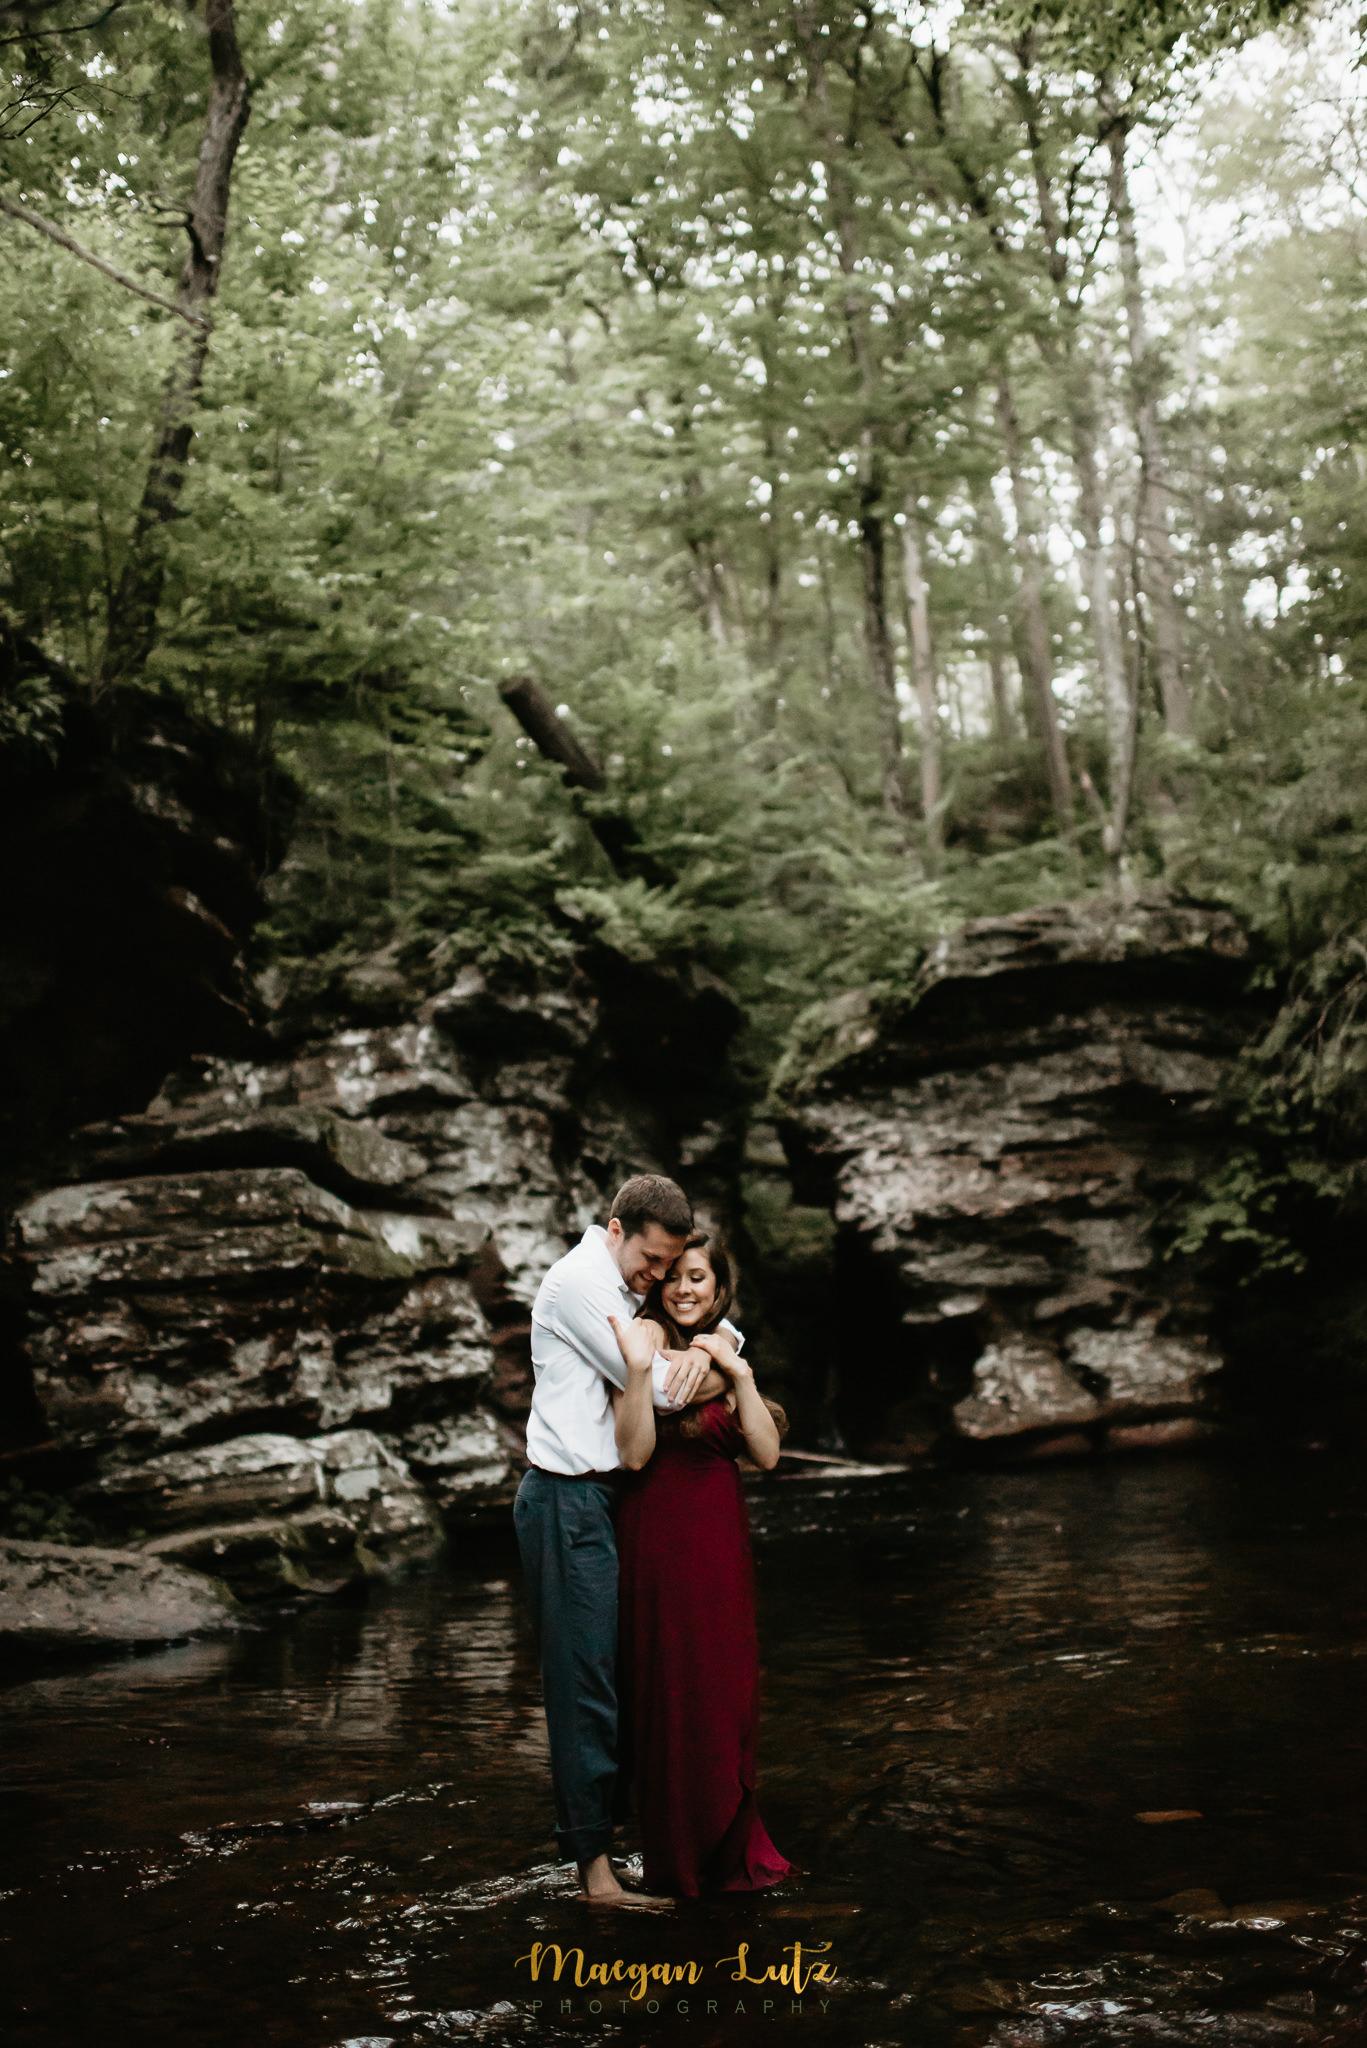 NEPA-Engagement-Wedding-Photographer-Session-at-Ricketts-Glen-State-Park-47.jpg